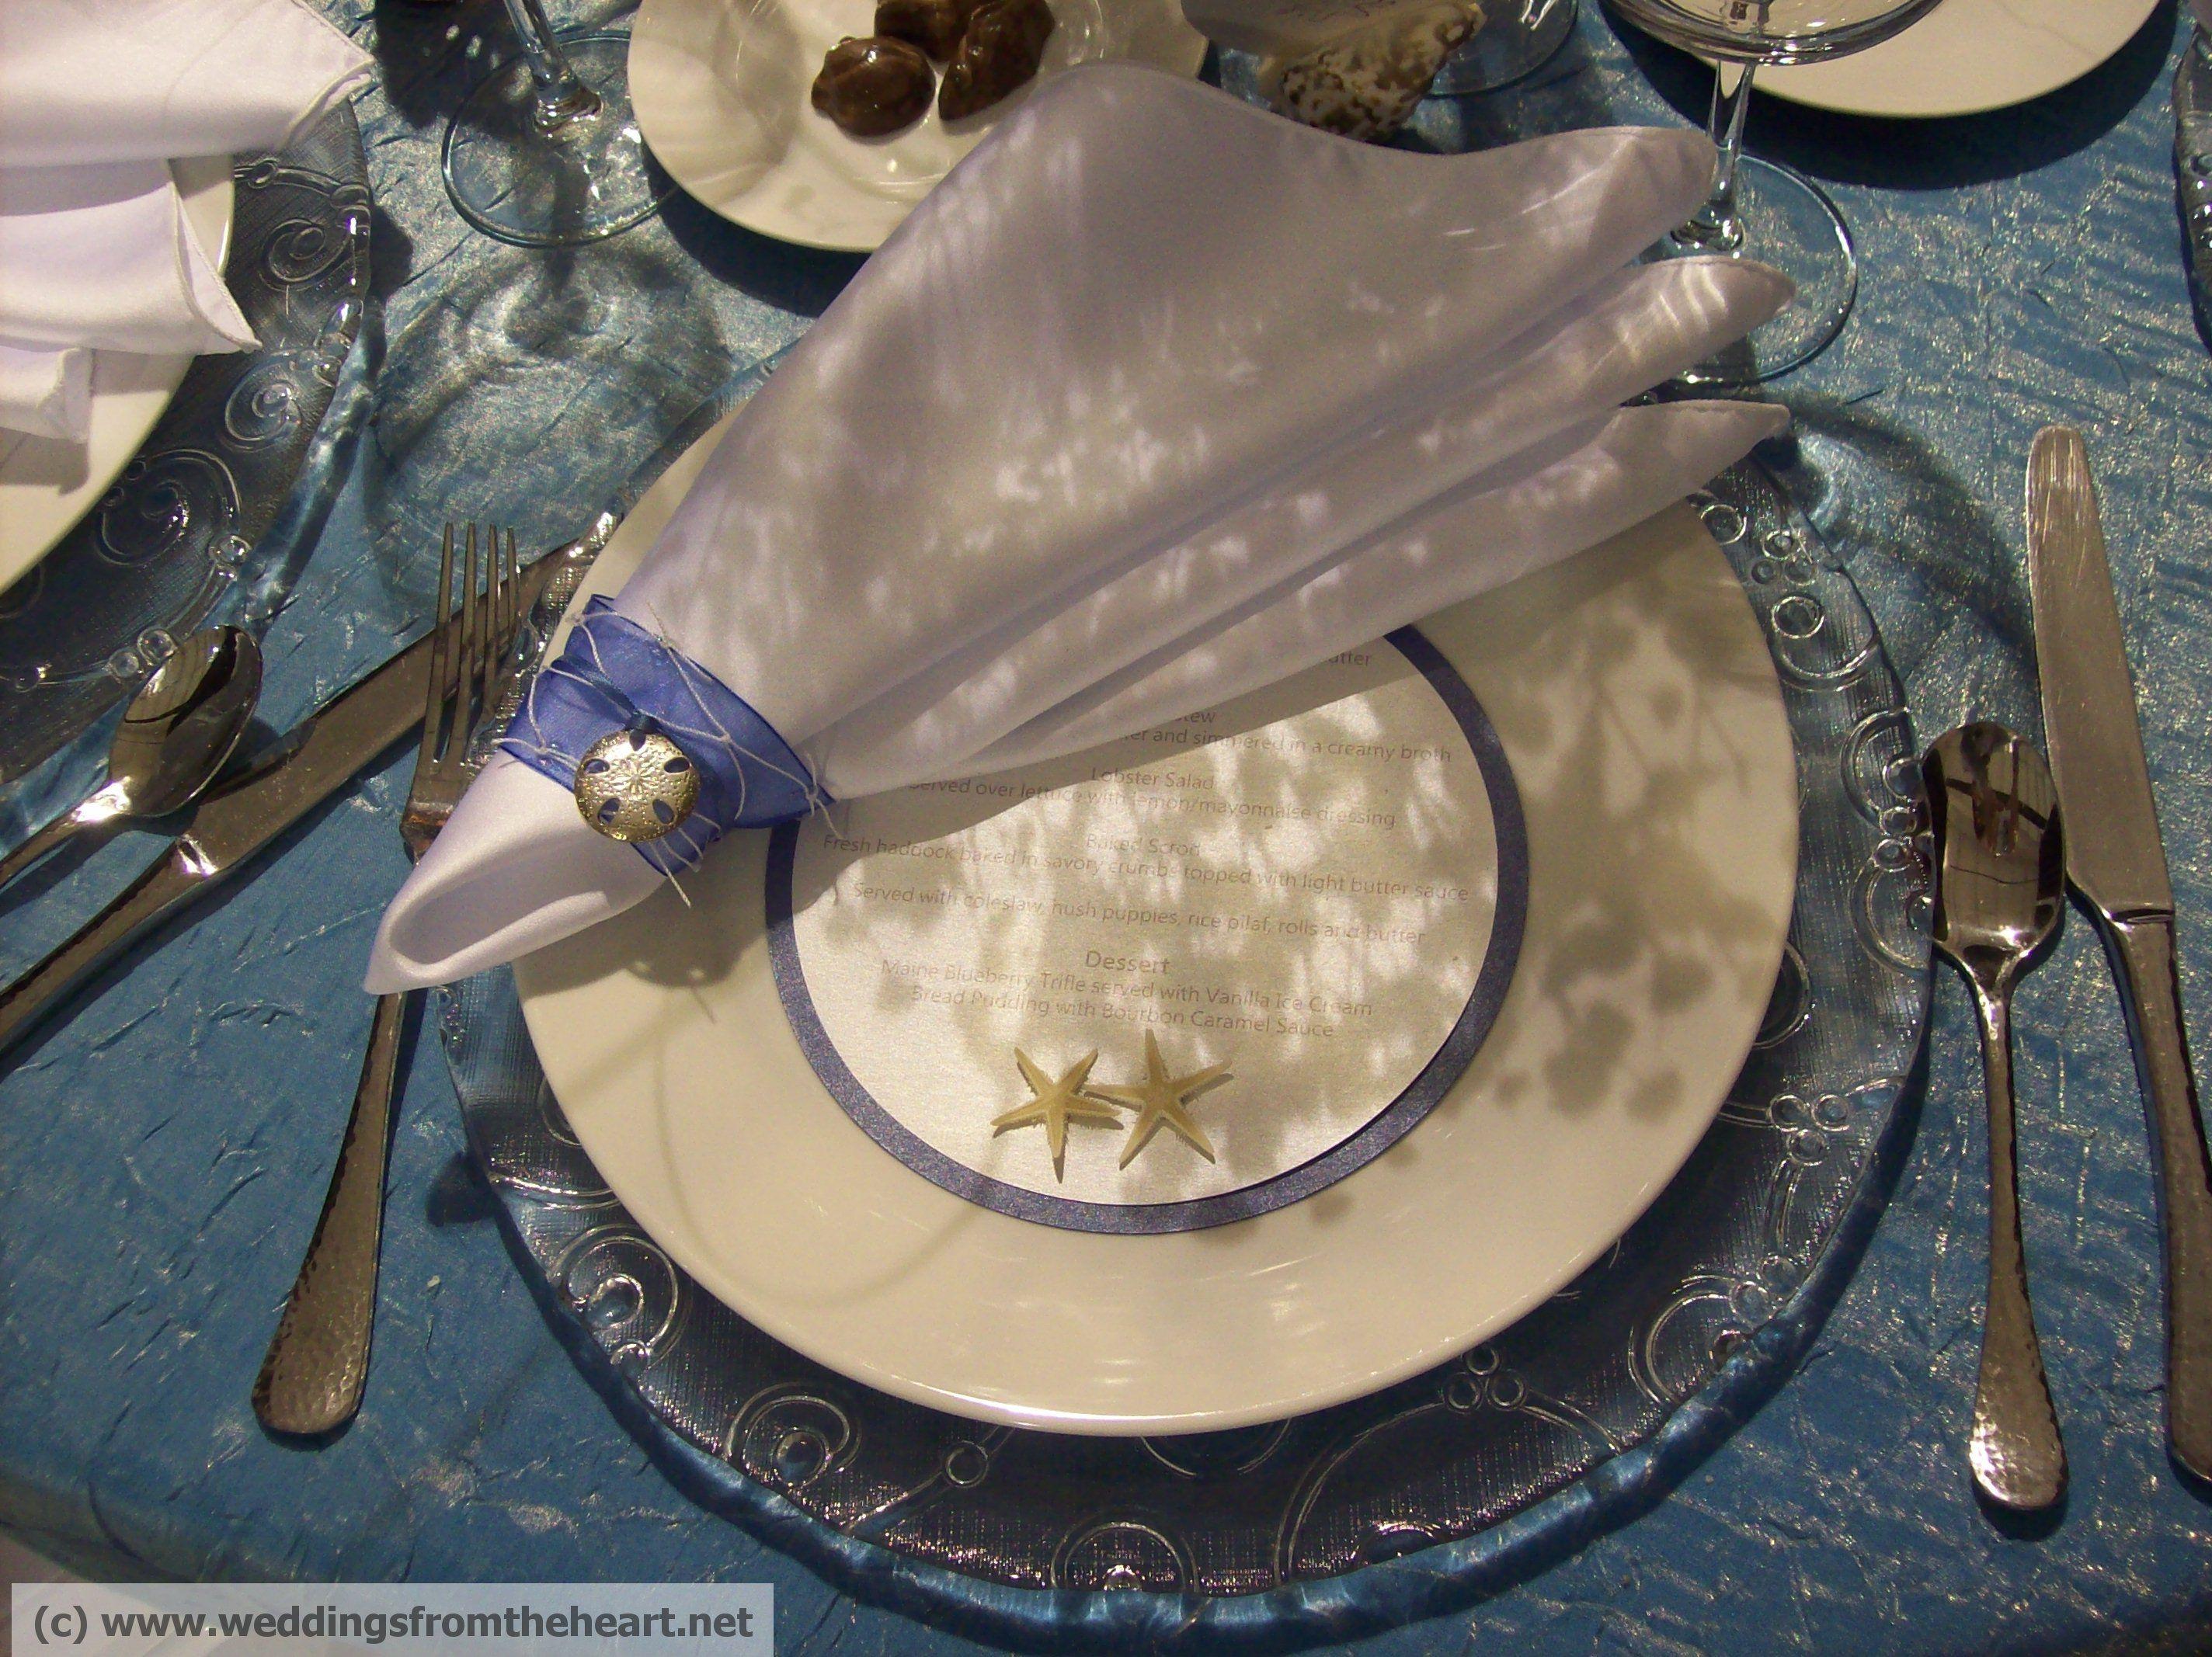 Starfish and seashell embellishments on the menu card and